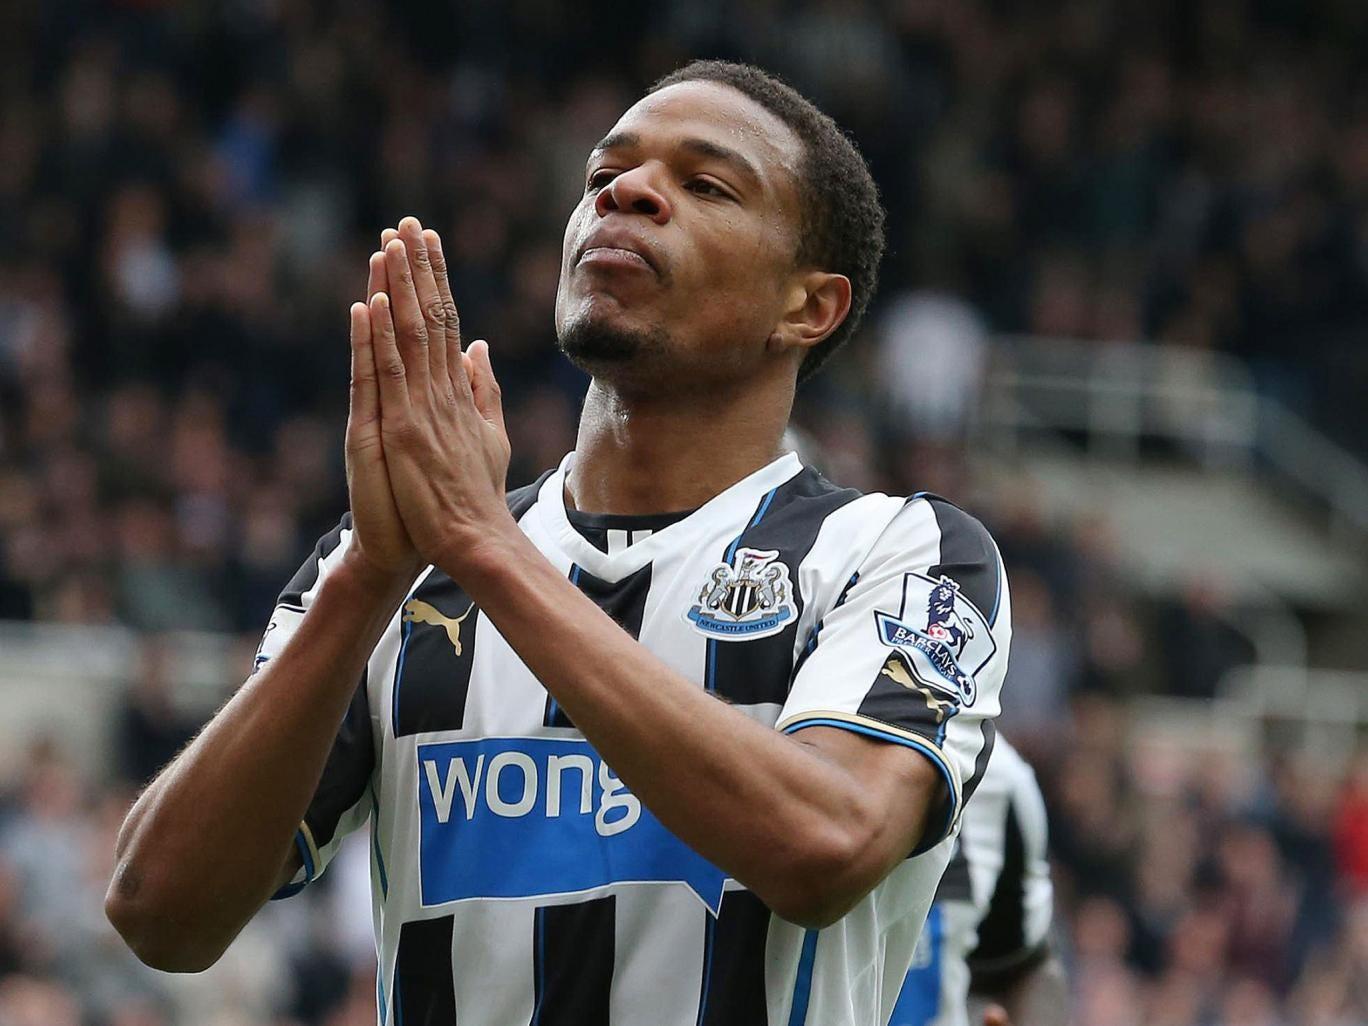 Loic Remy doubles Newcastle's lead